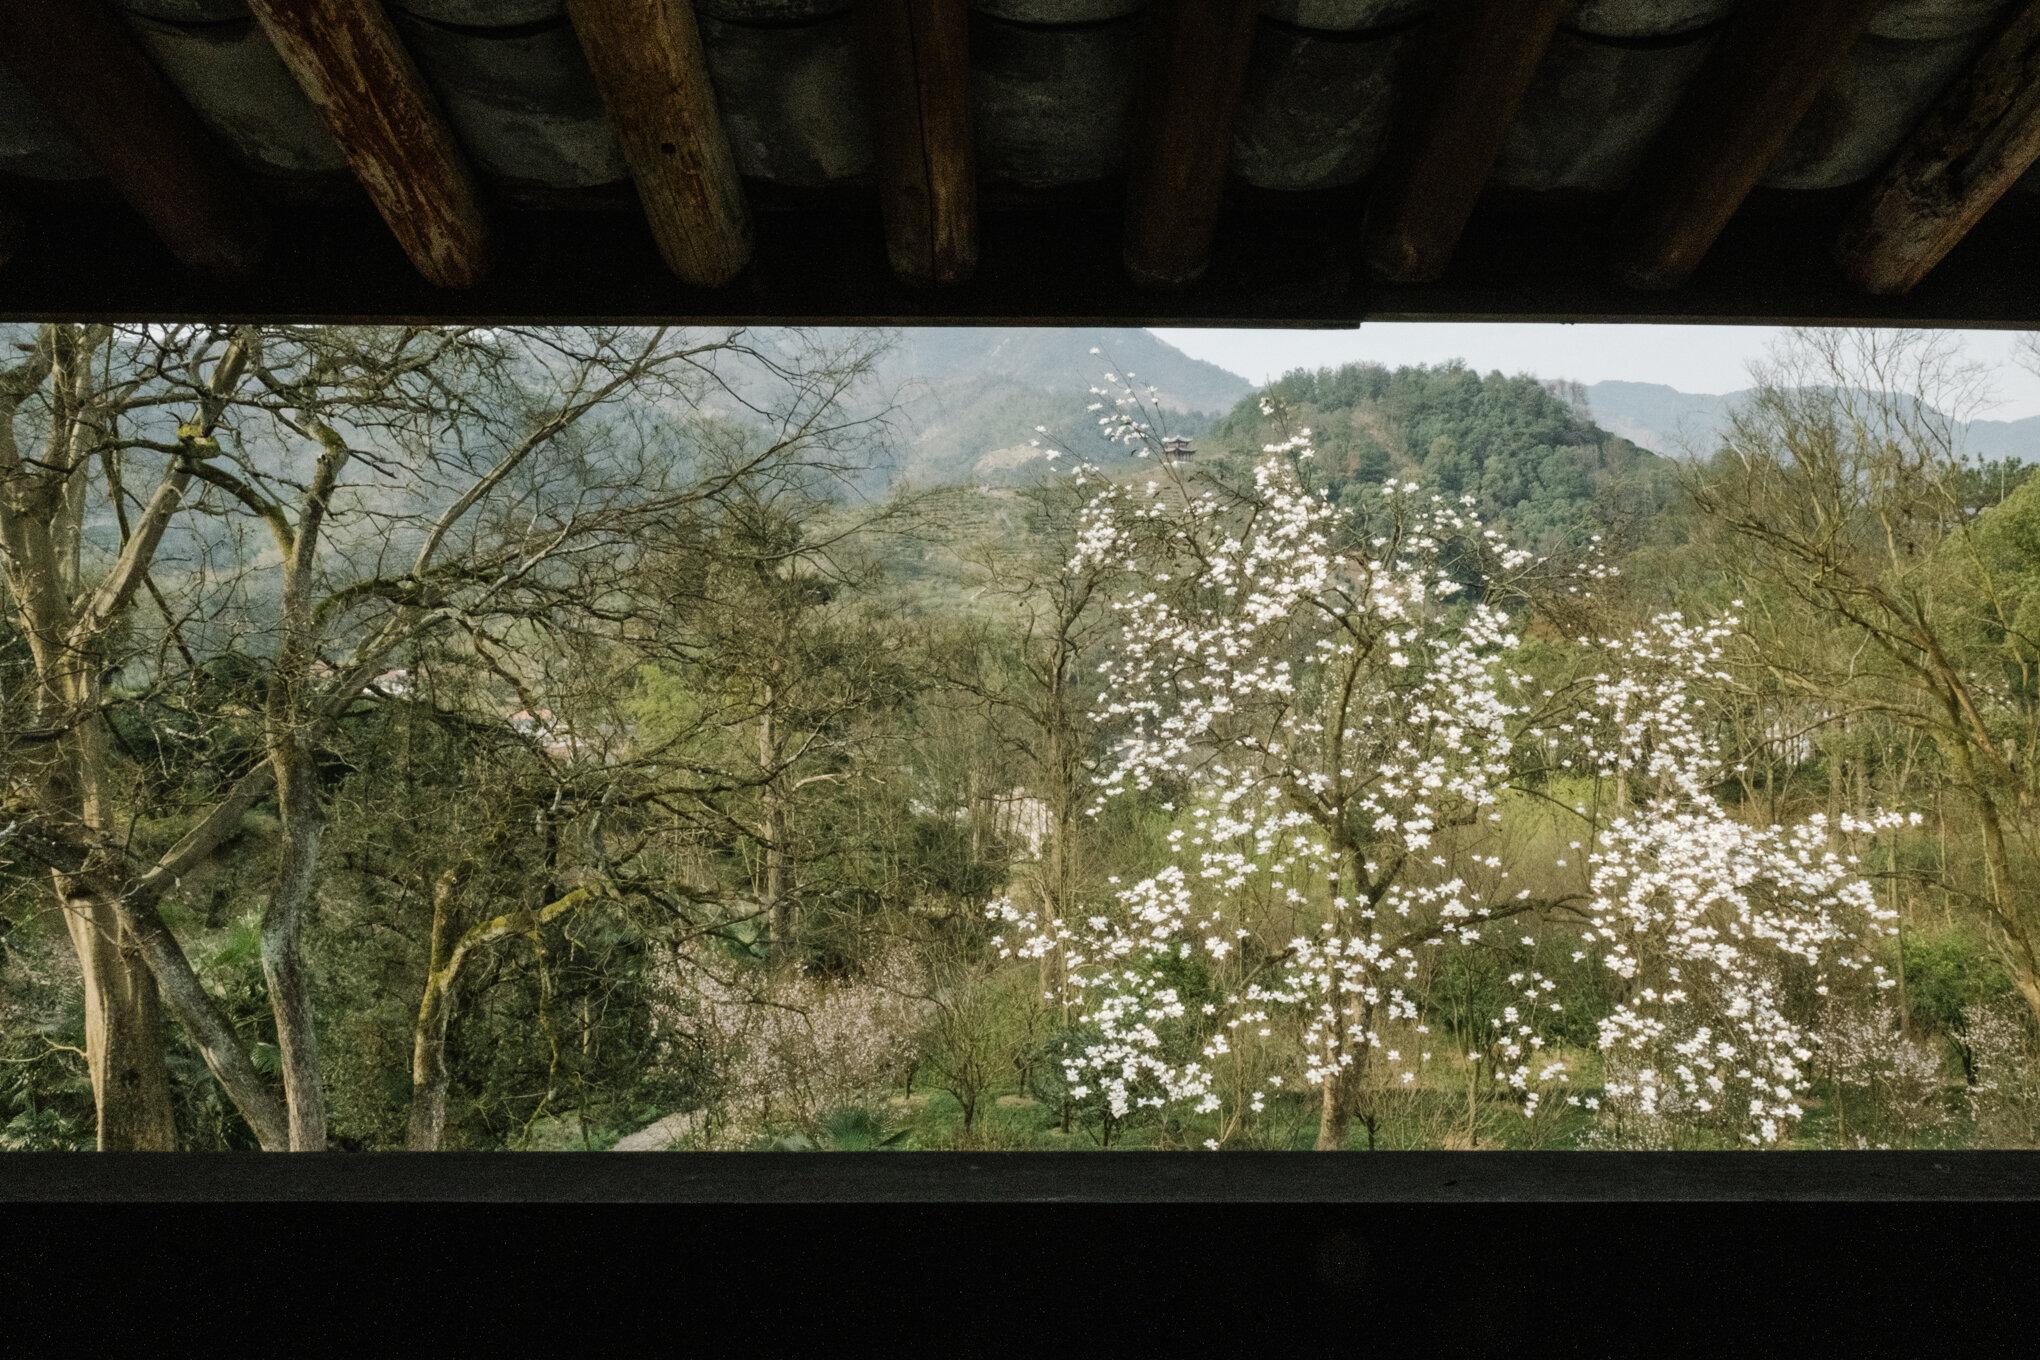 Documentary photography Travel photography Fujifilm Charmaine Wu Photography Thousand Pillar House China XT3 GFX50R 千柱屋 (诸暨市东白湖镇斯宅村千柱屋)